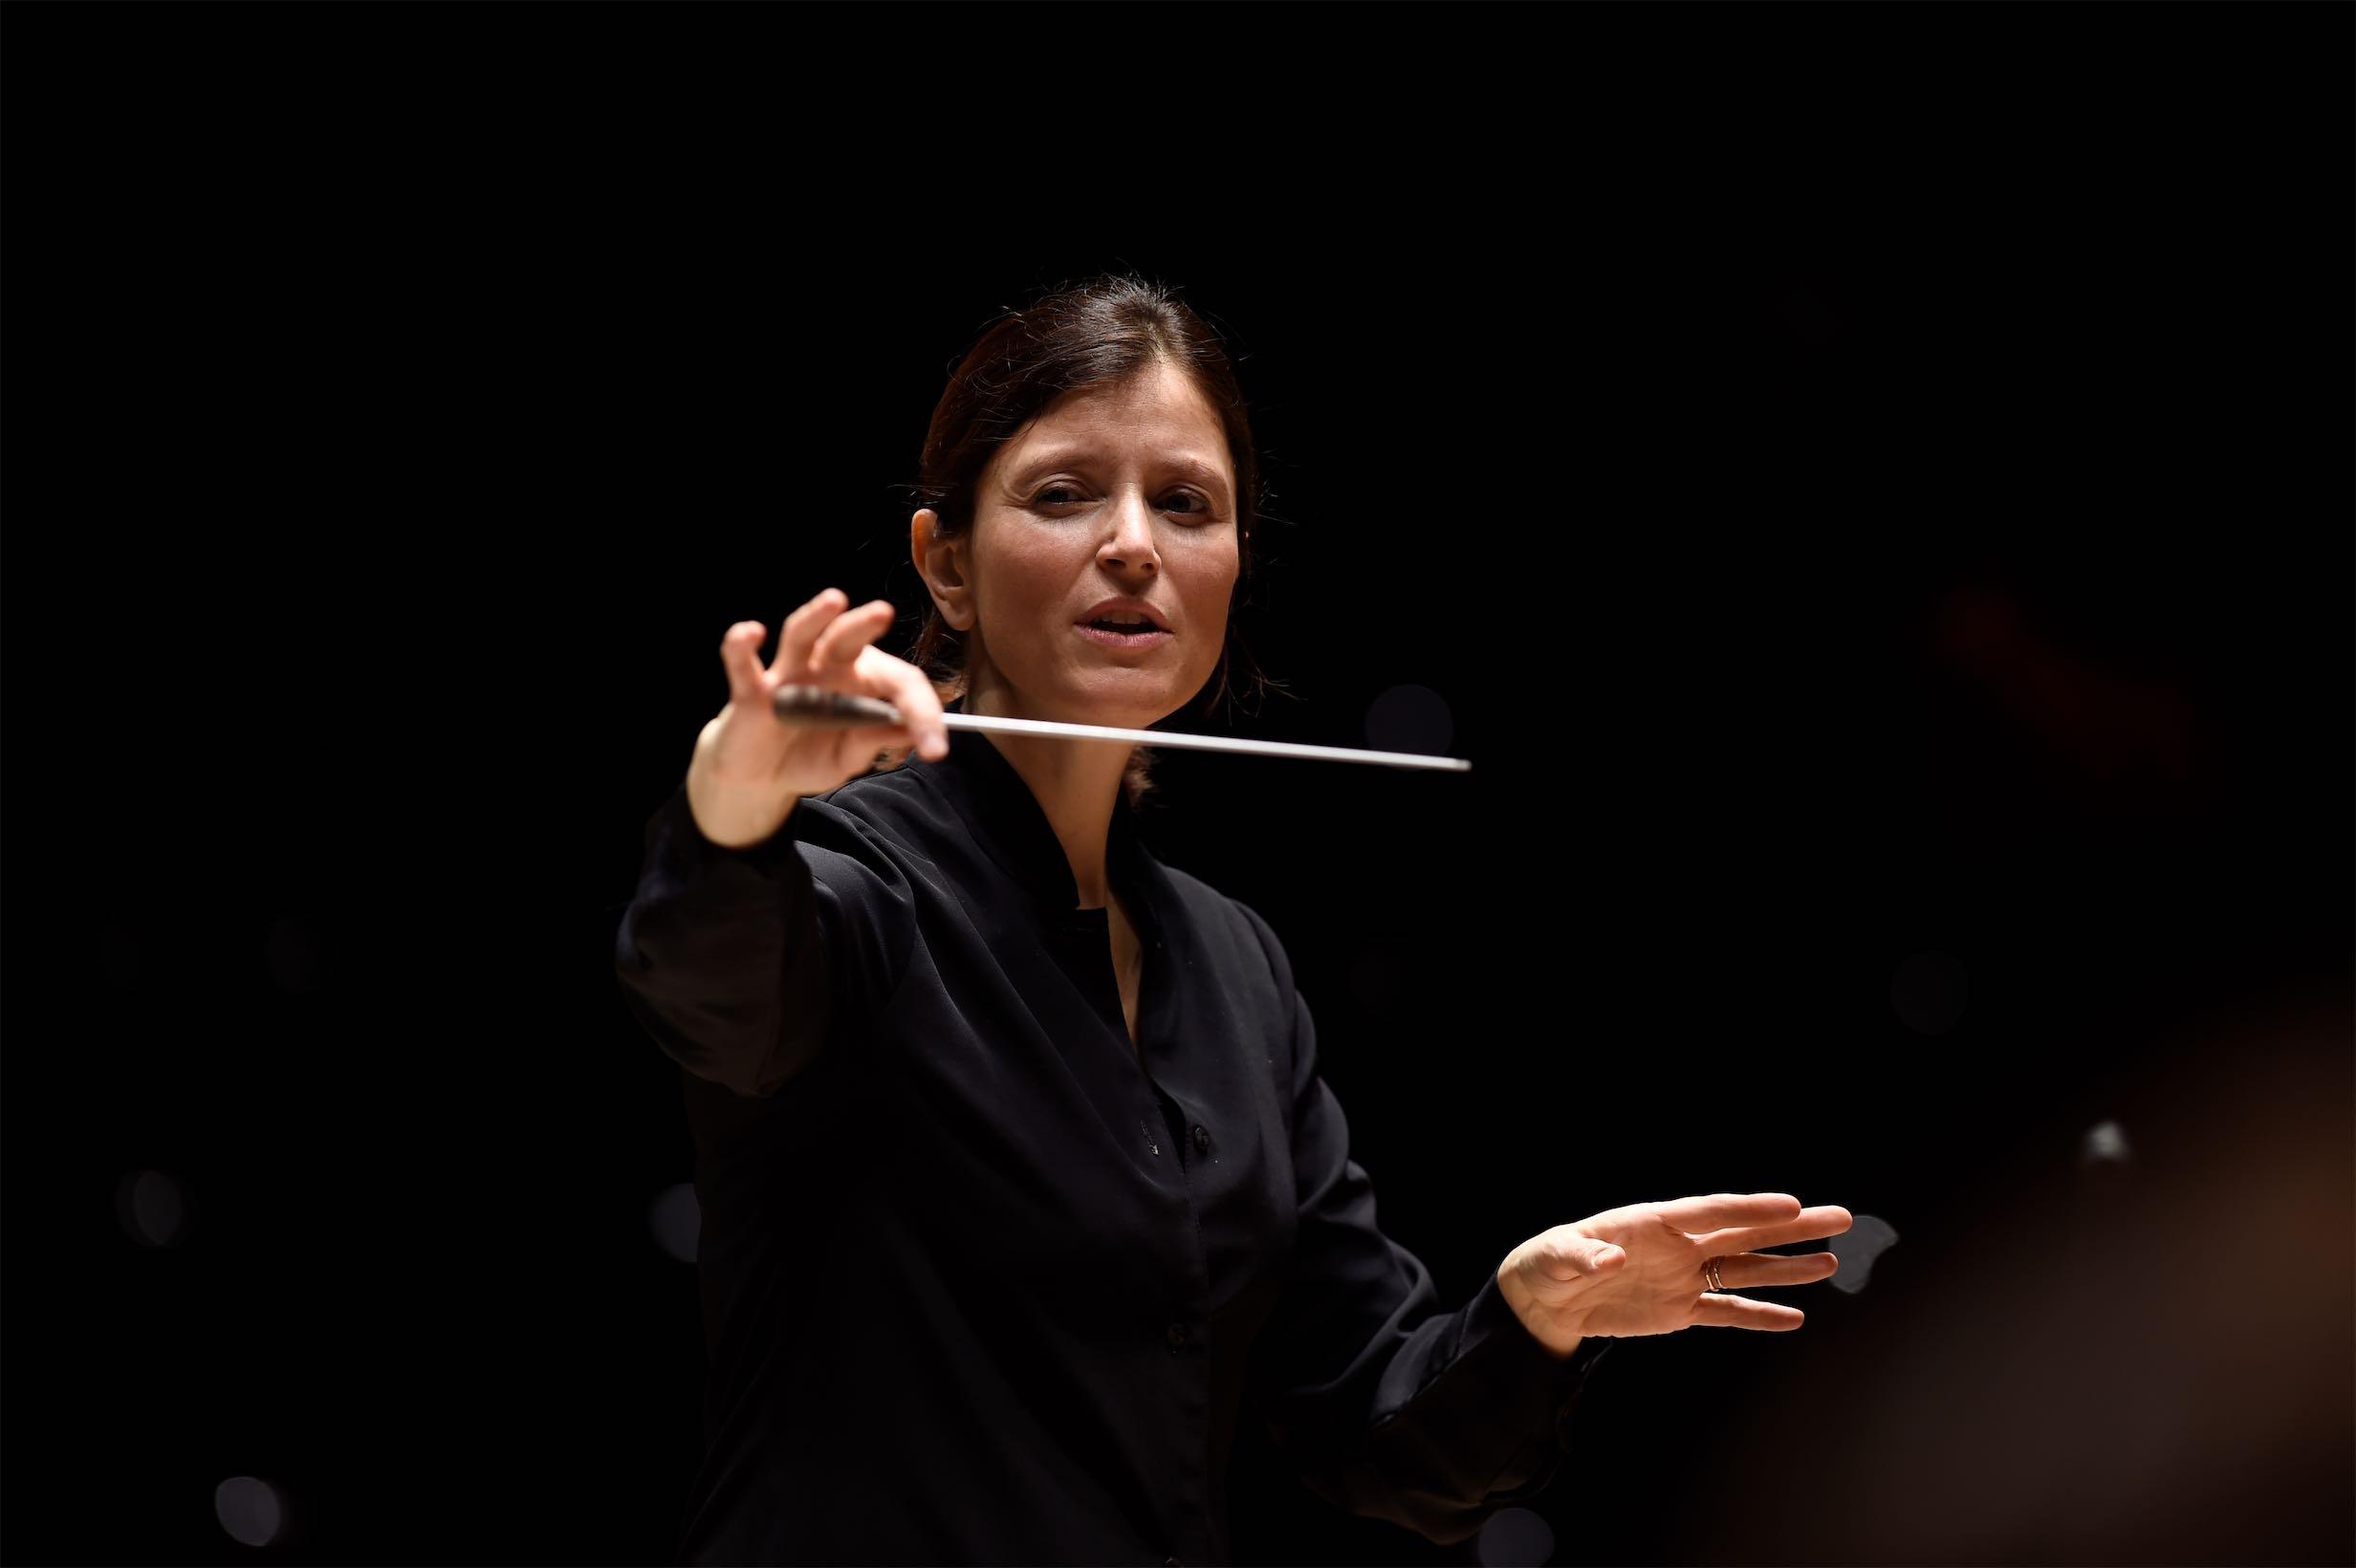 Debora waldman directrice musicale